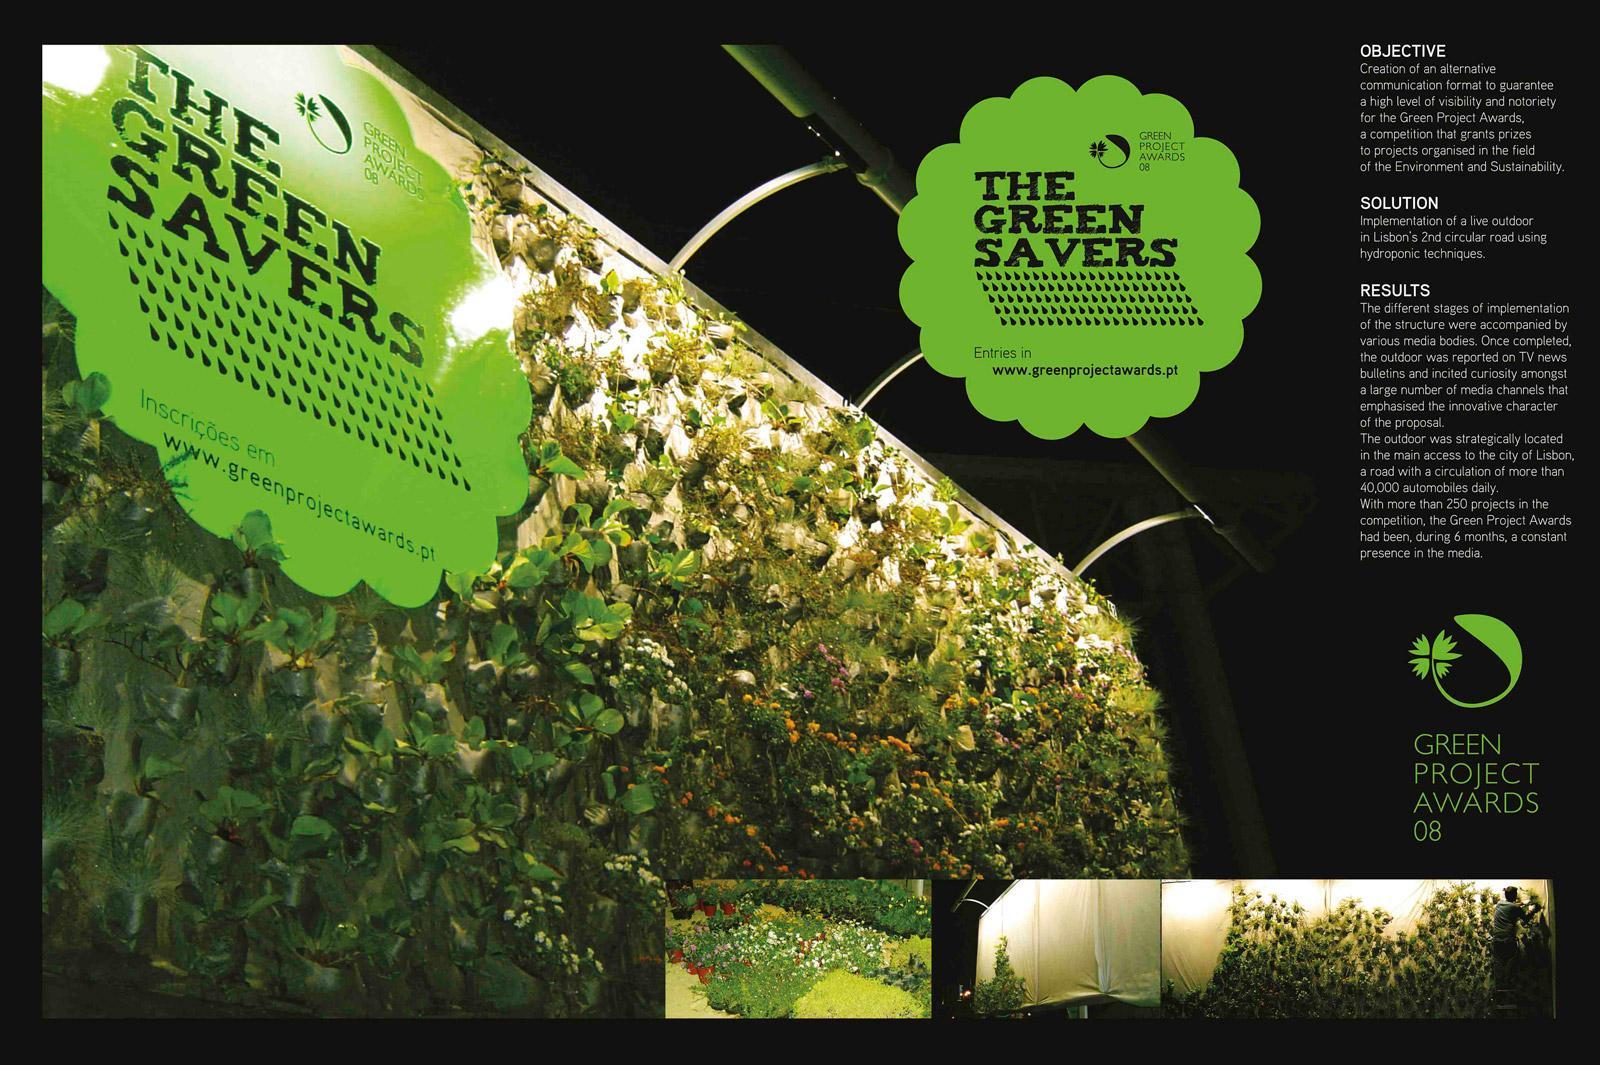 The green savers